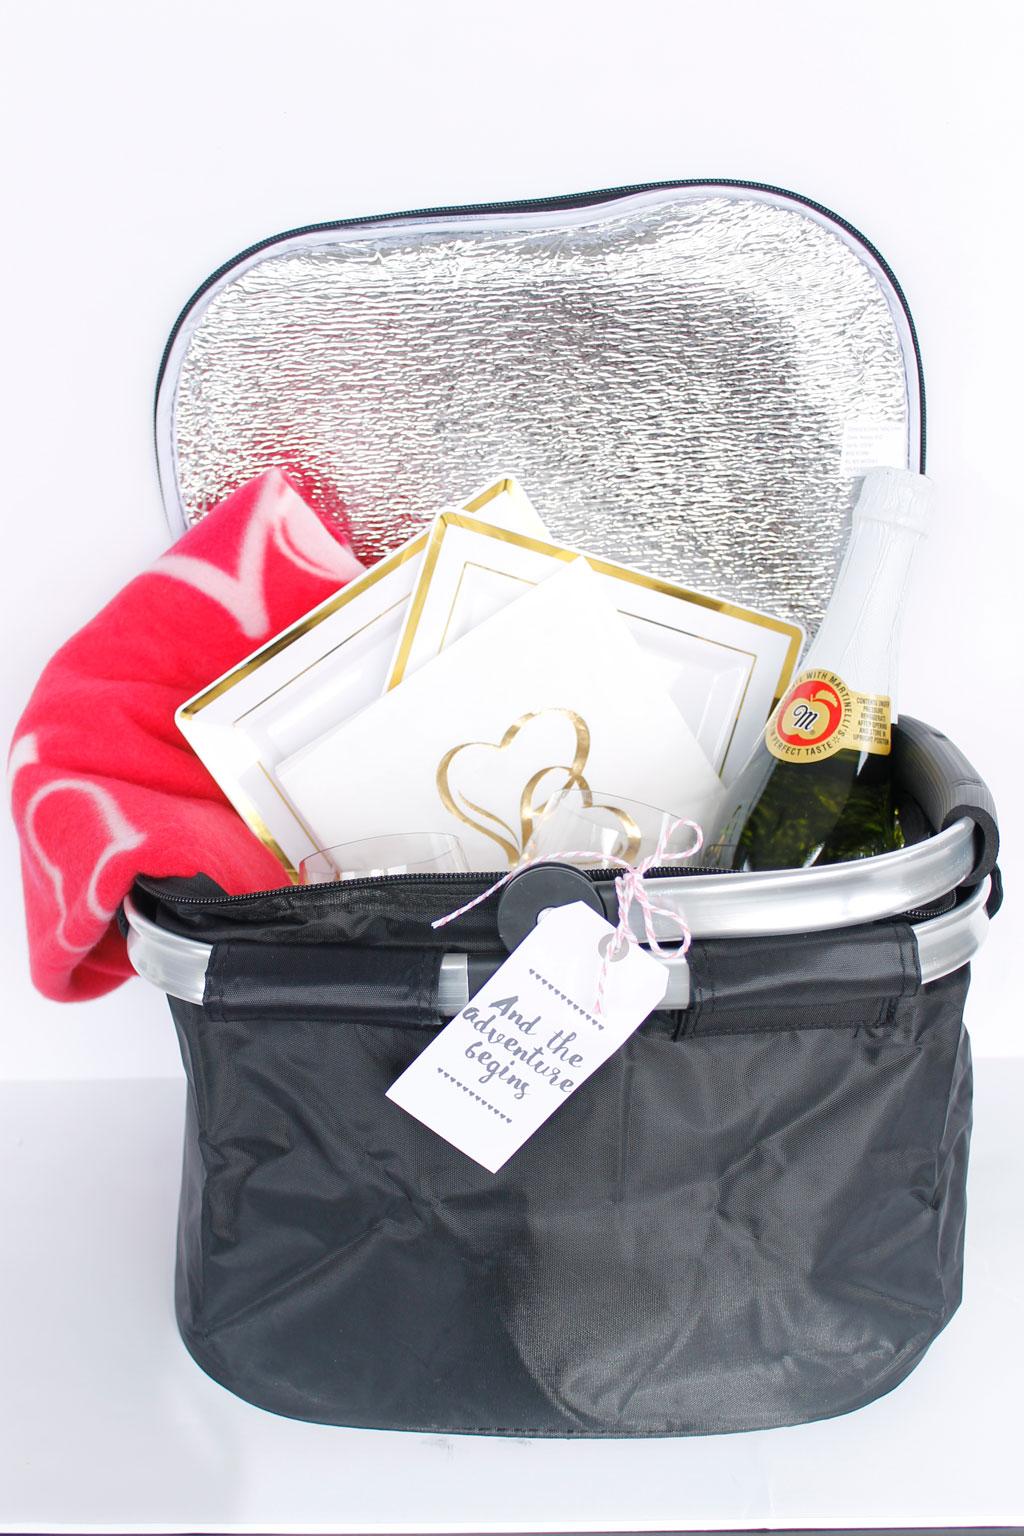 DIY Couples Picnic Basket Gift Idea